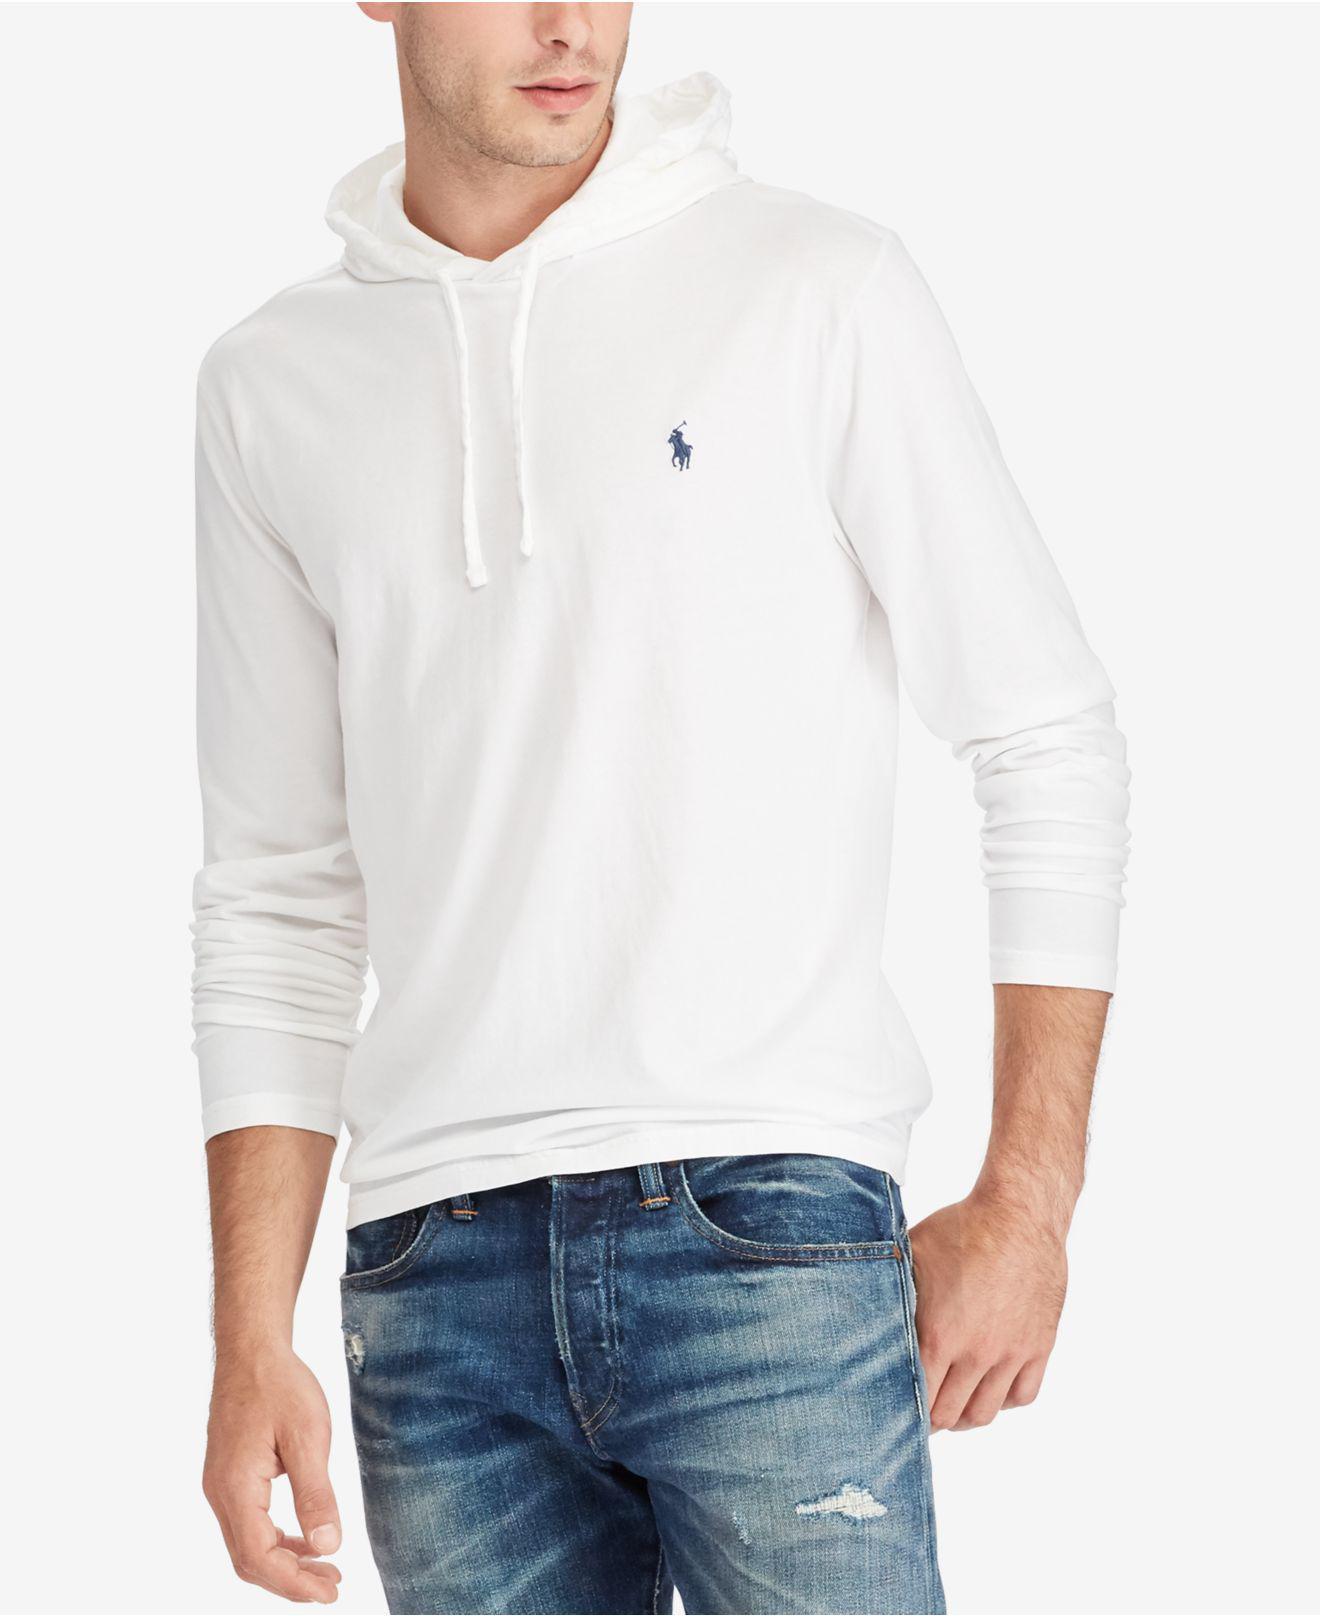 2b6b0c70 Polo Ralph Lauren Men's Jersey T-shirt Hoodie in White for Men - Lyst